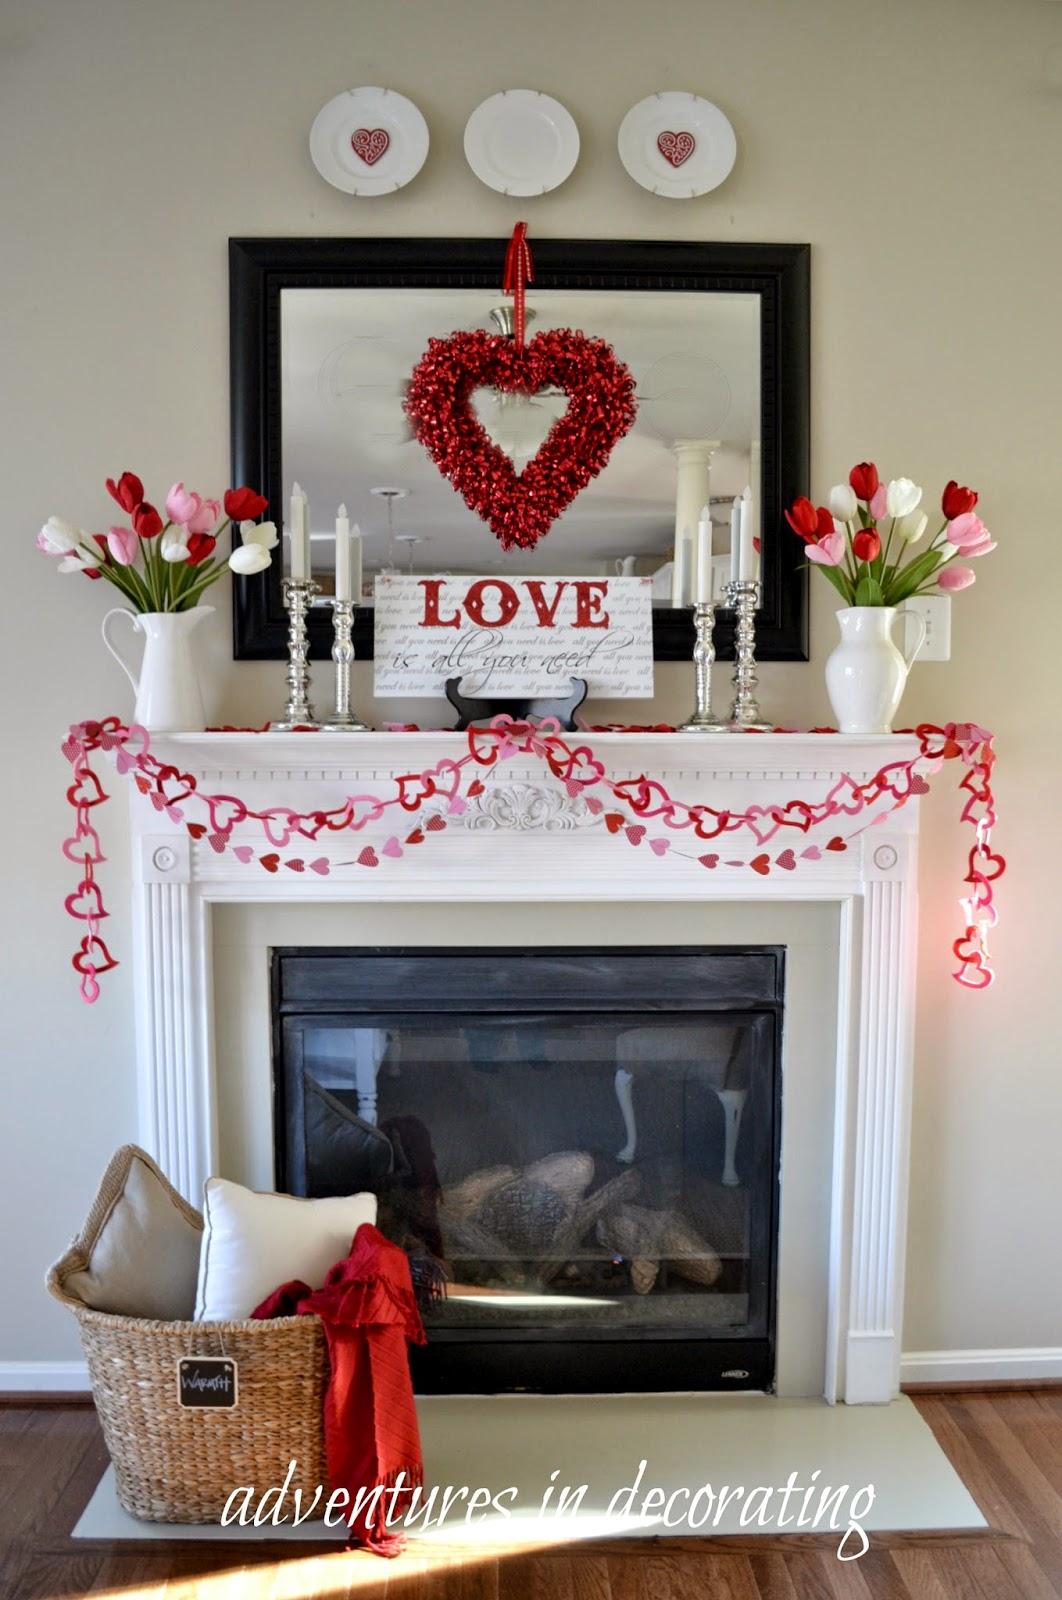 Heart Mantel Decor for Valentine's